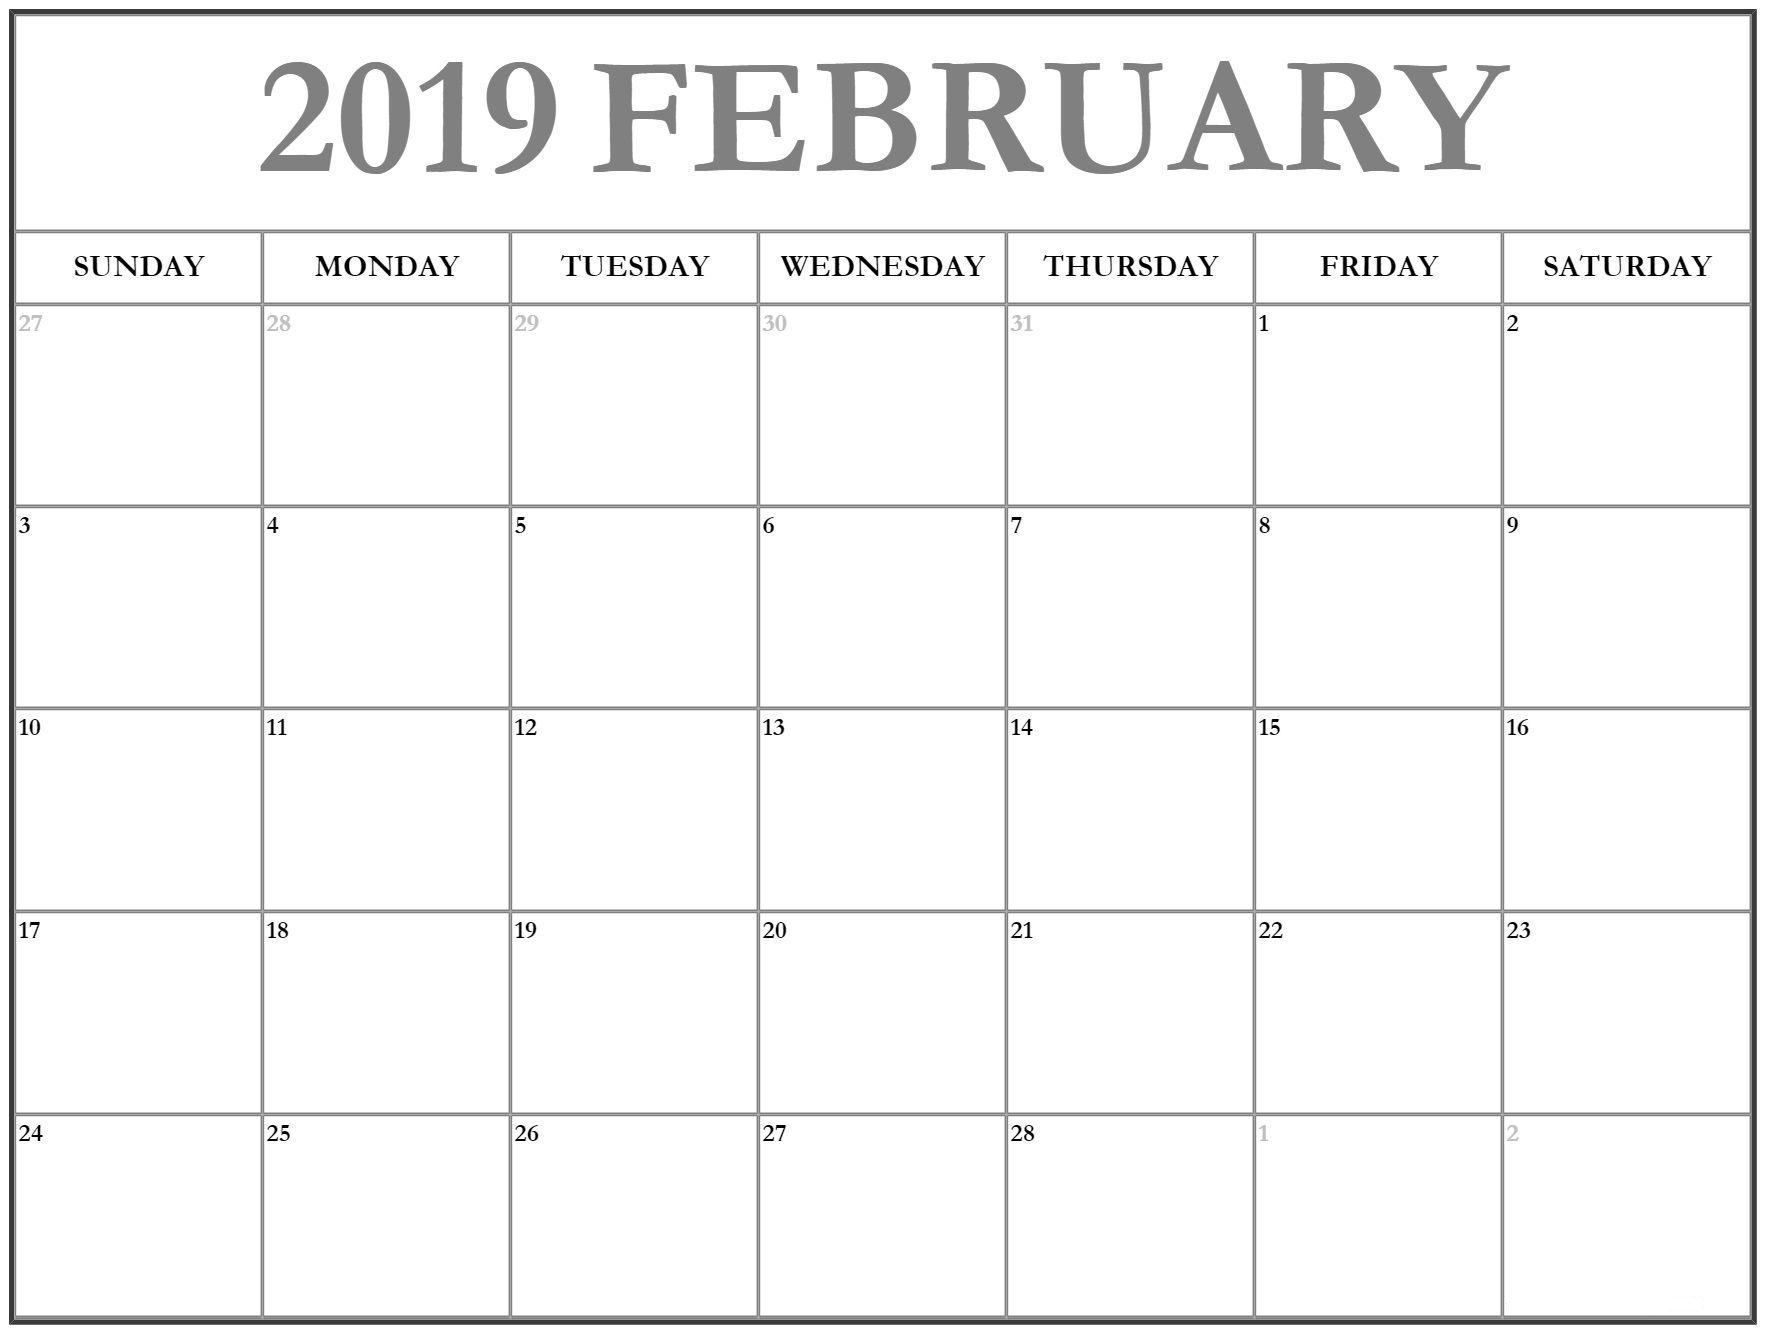 february 2019 editable calendar free printable calendar templates::February 2019 Calendar Editable